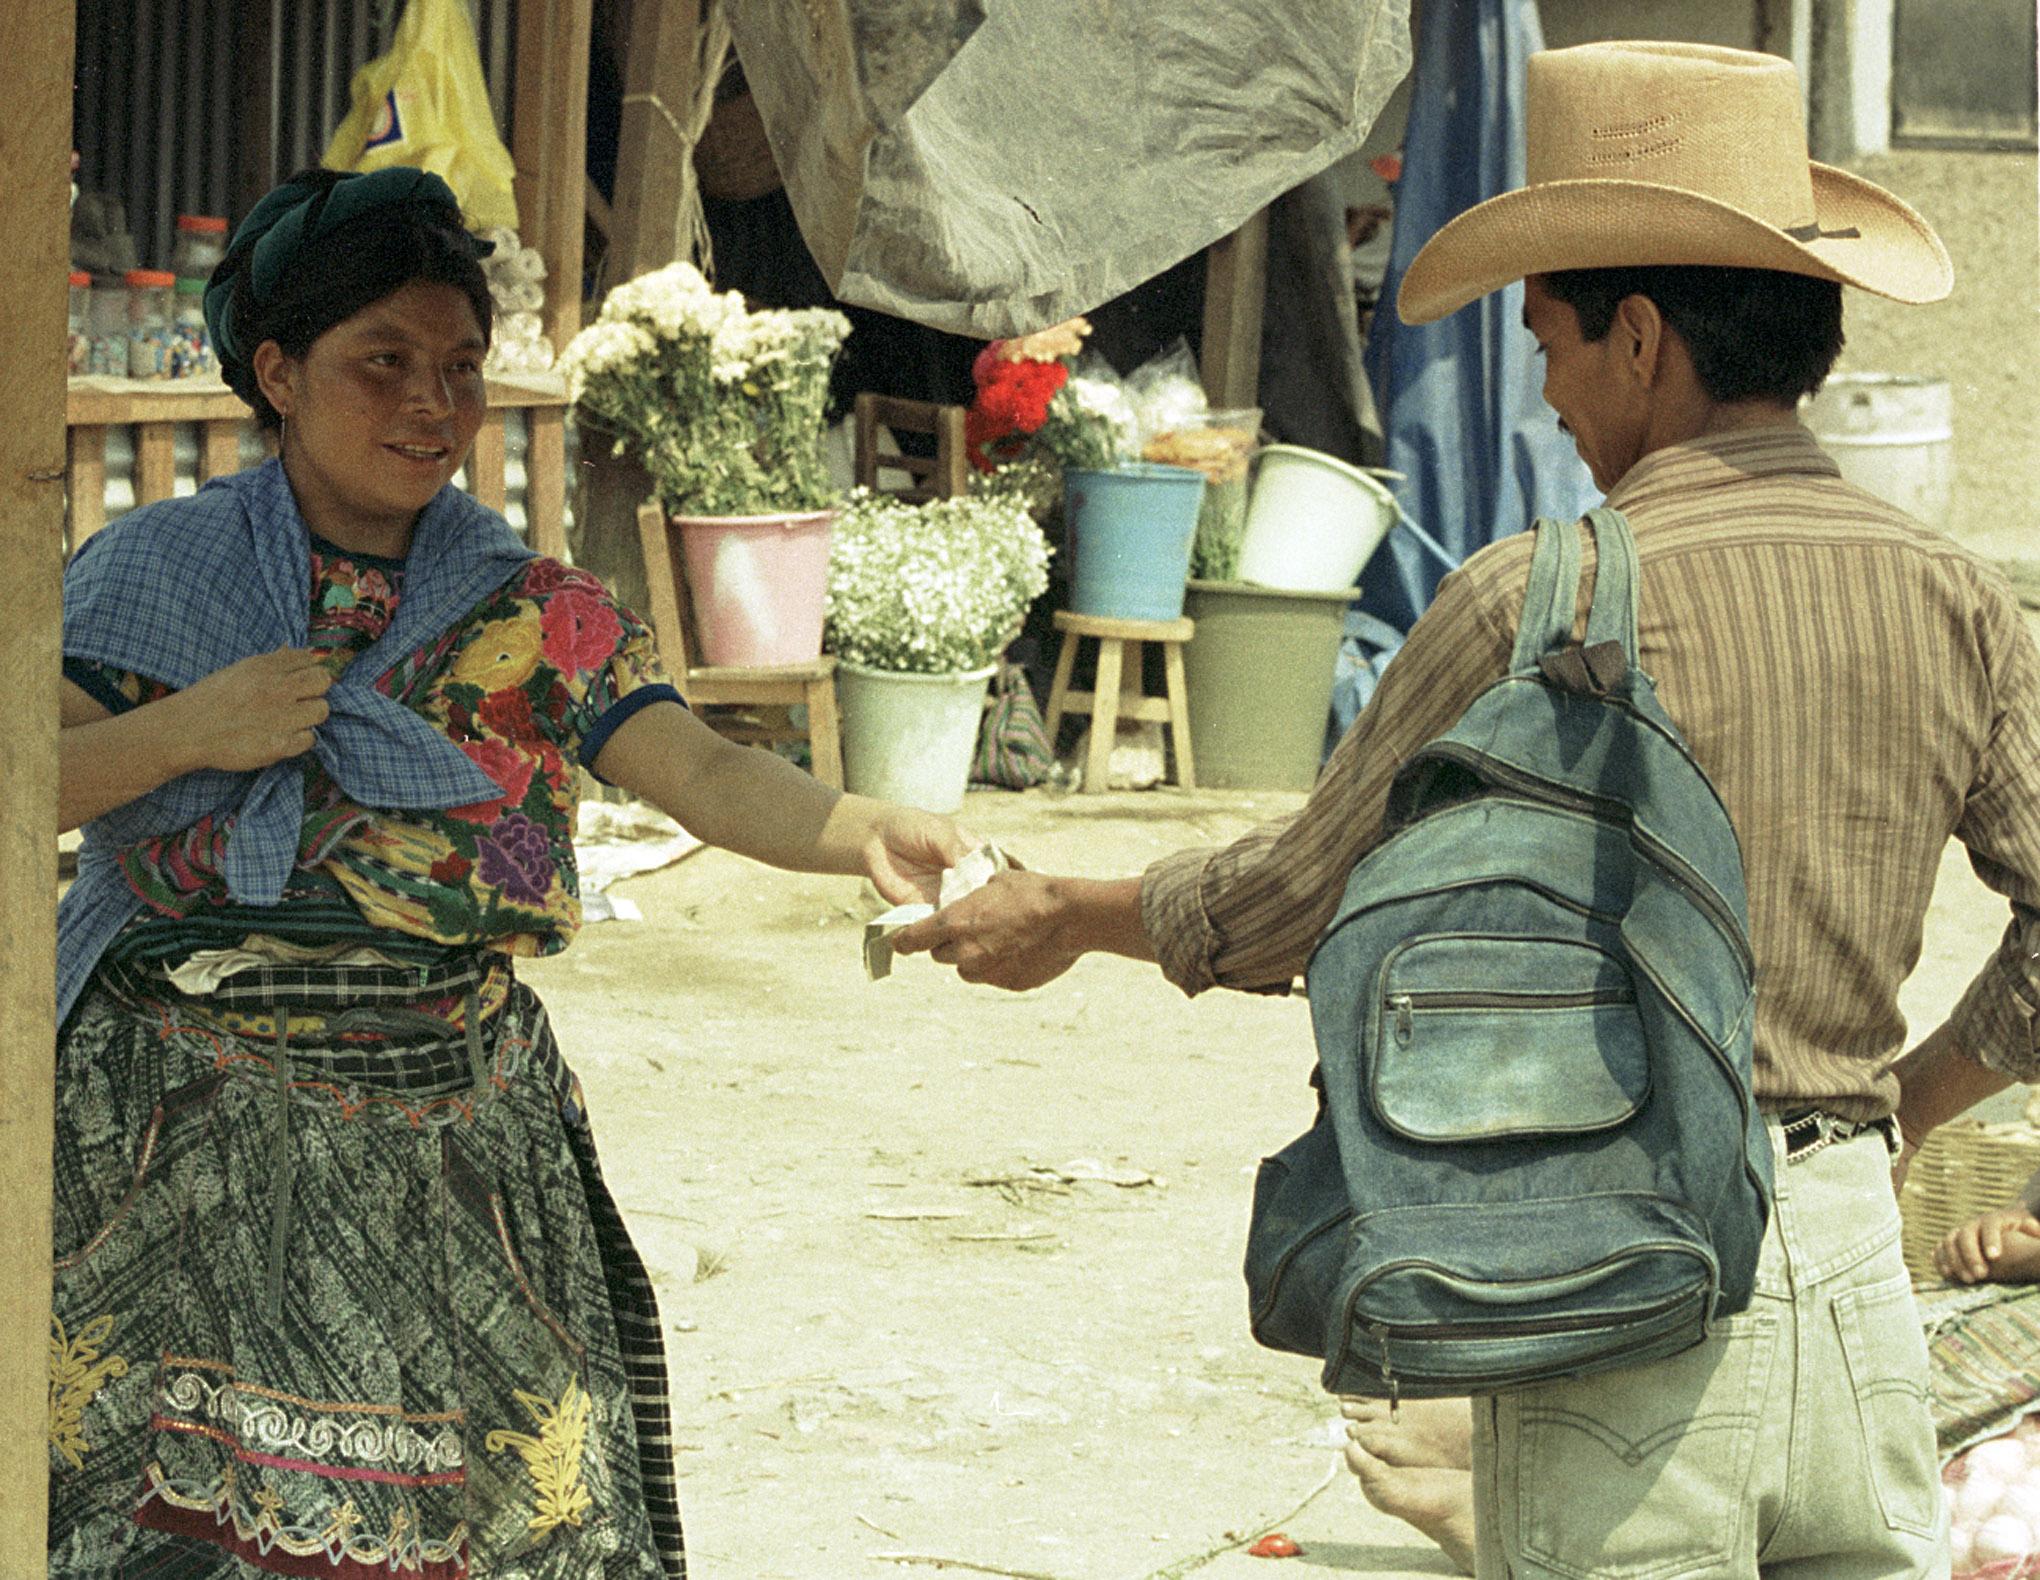 Guatemalans - 1